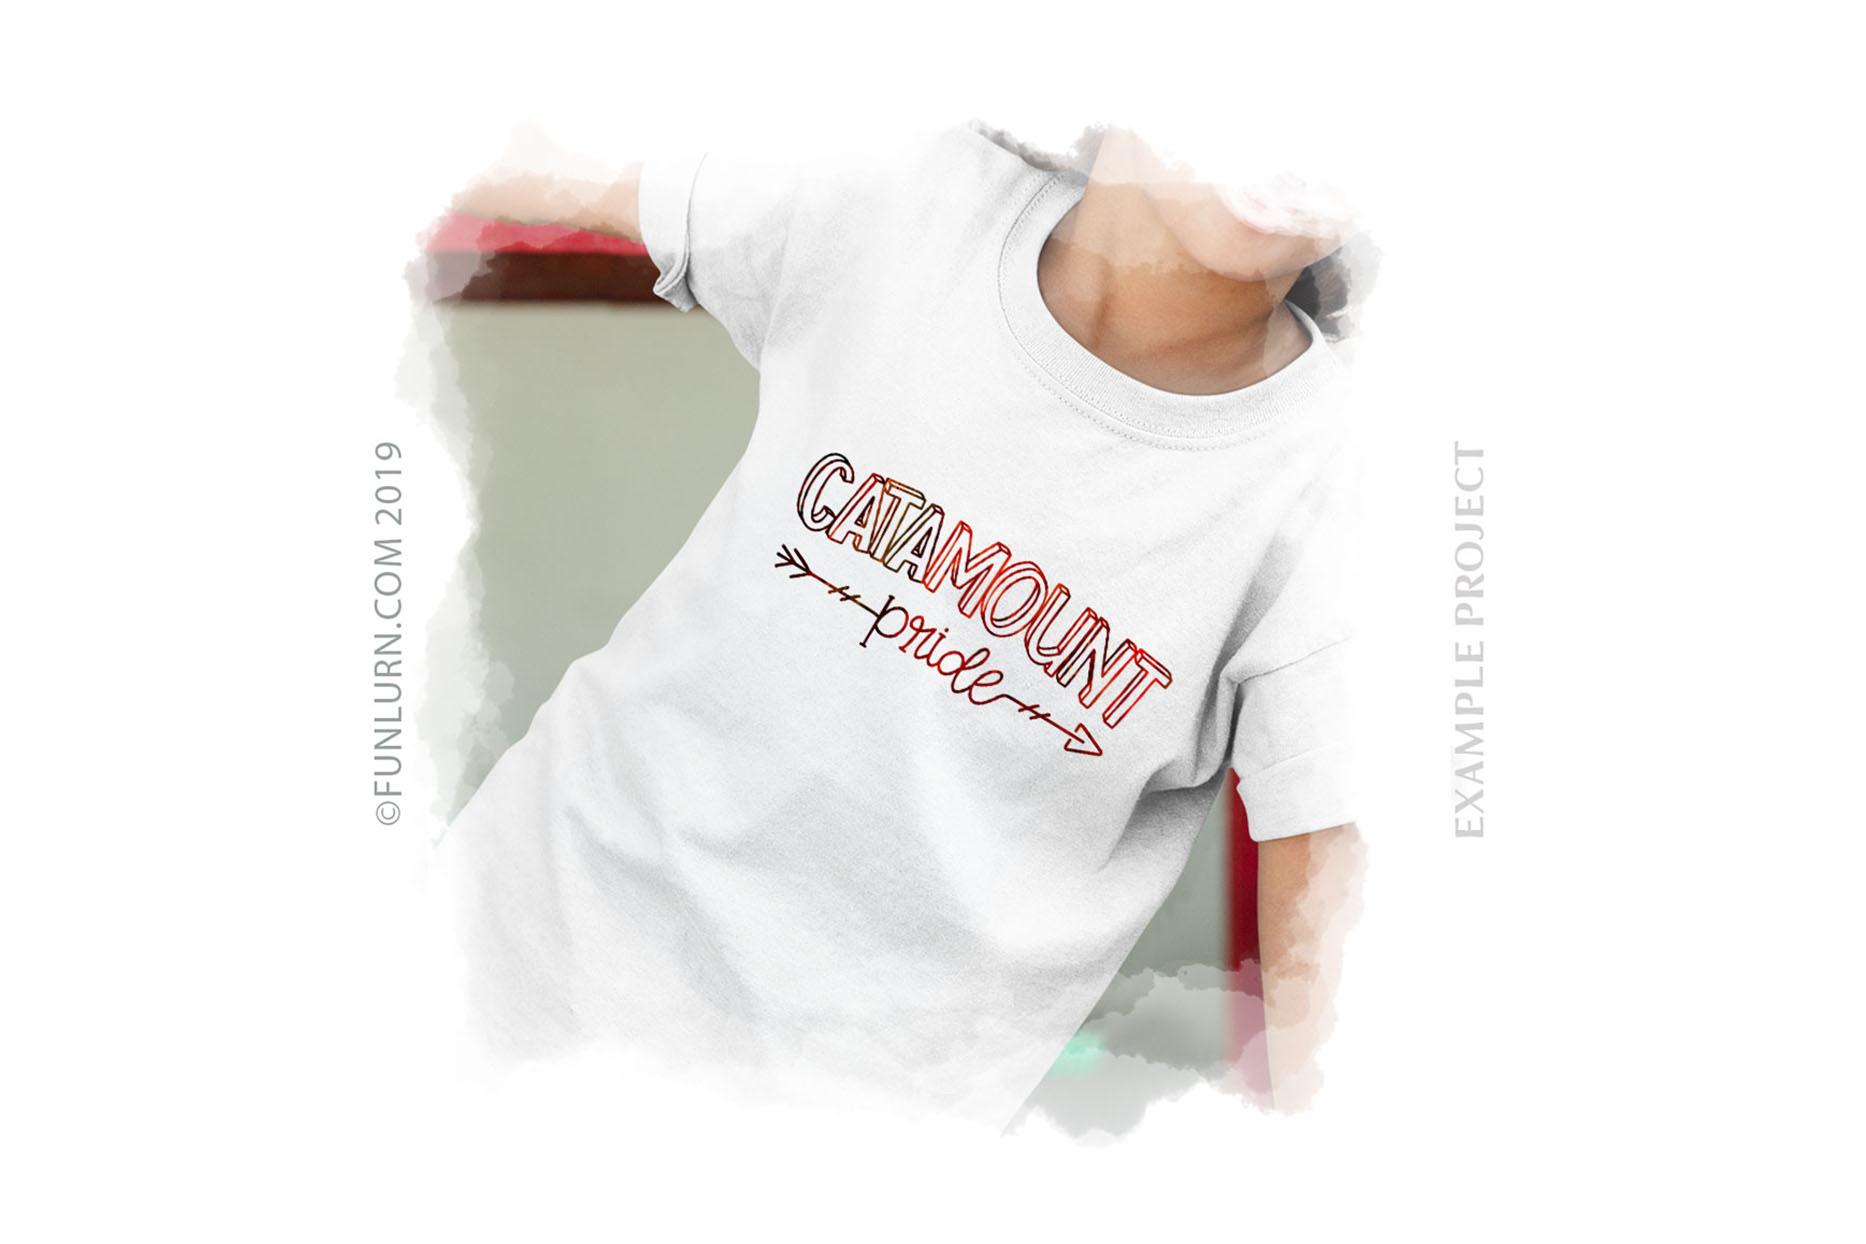 Catamount Pride Team SVG Cut File example image 3